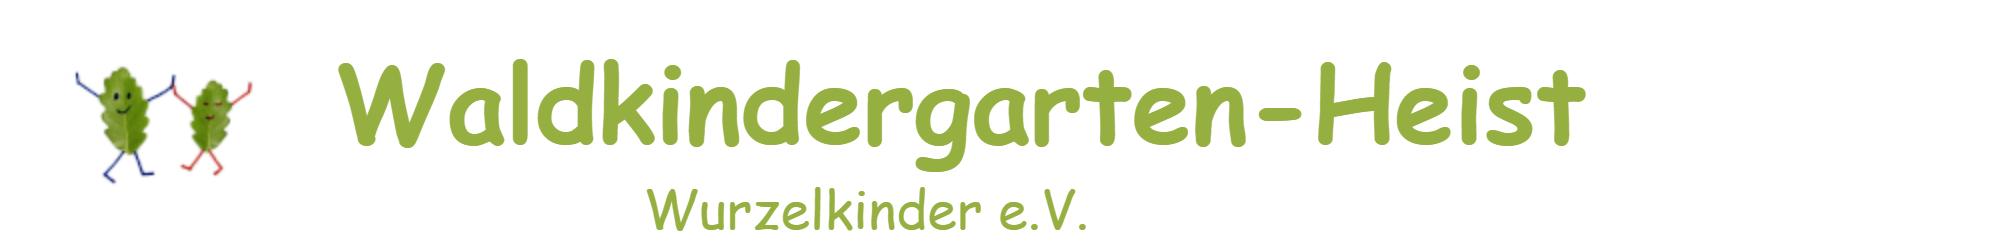 Waldkindergarten Heist Wurzelkinder e.V.